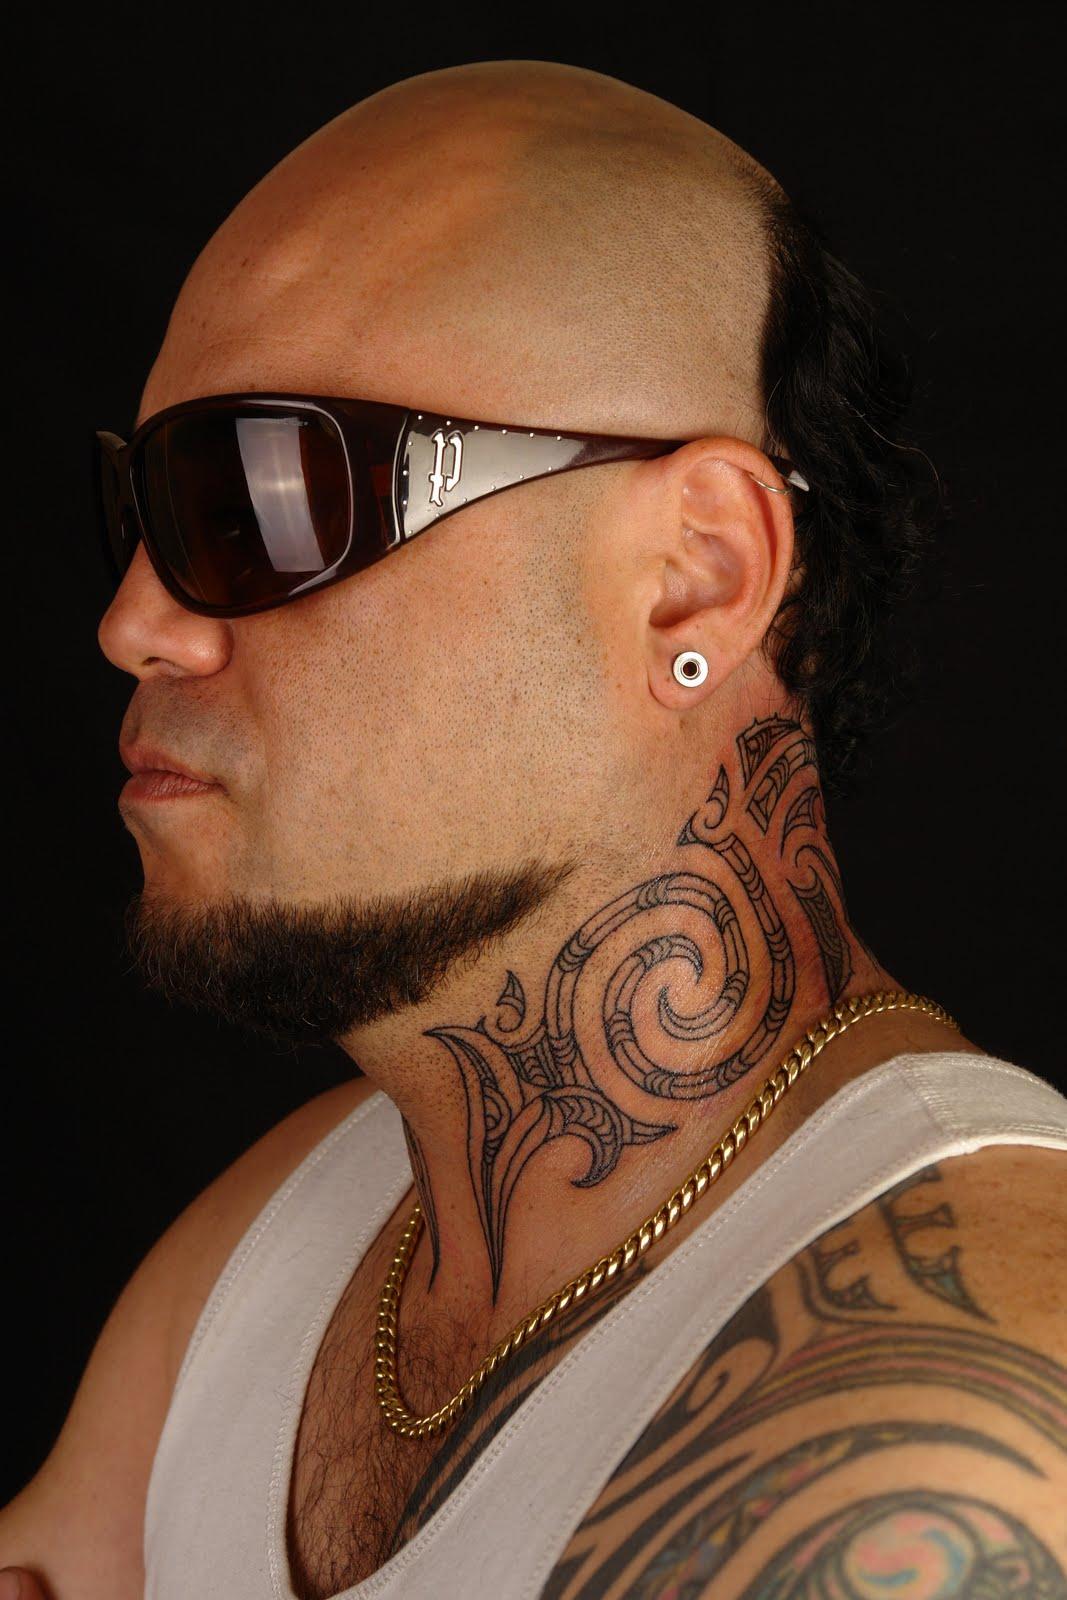 Traditional Maori Art: Body Art World Tattoos: Maori Tattoo Art And Traditional